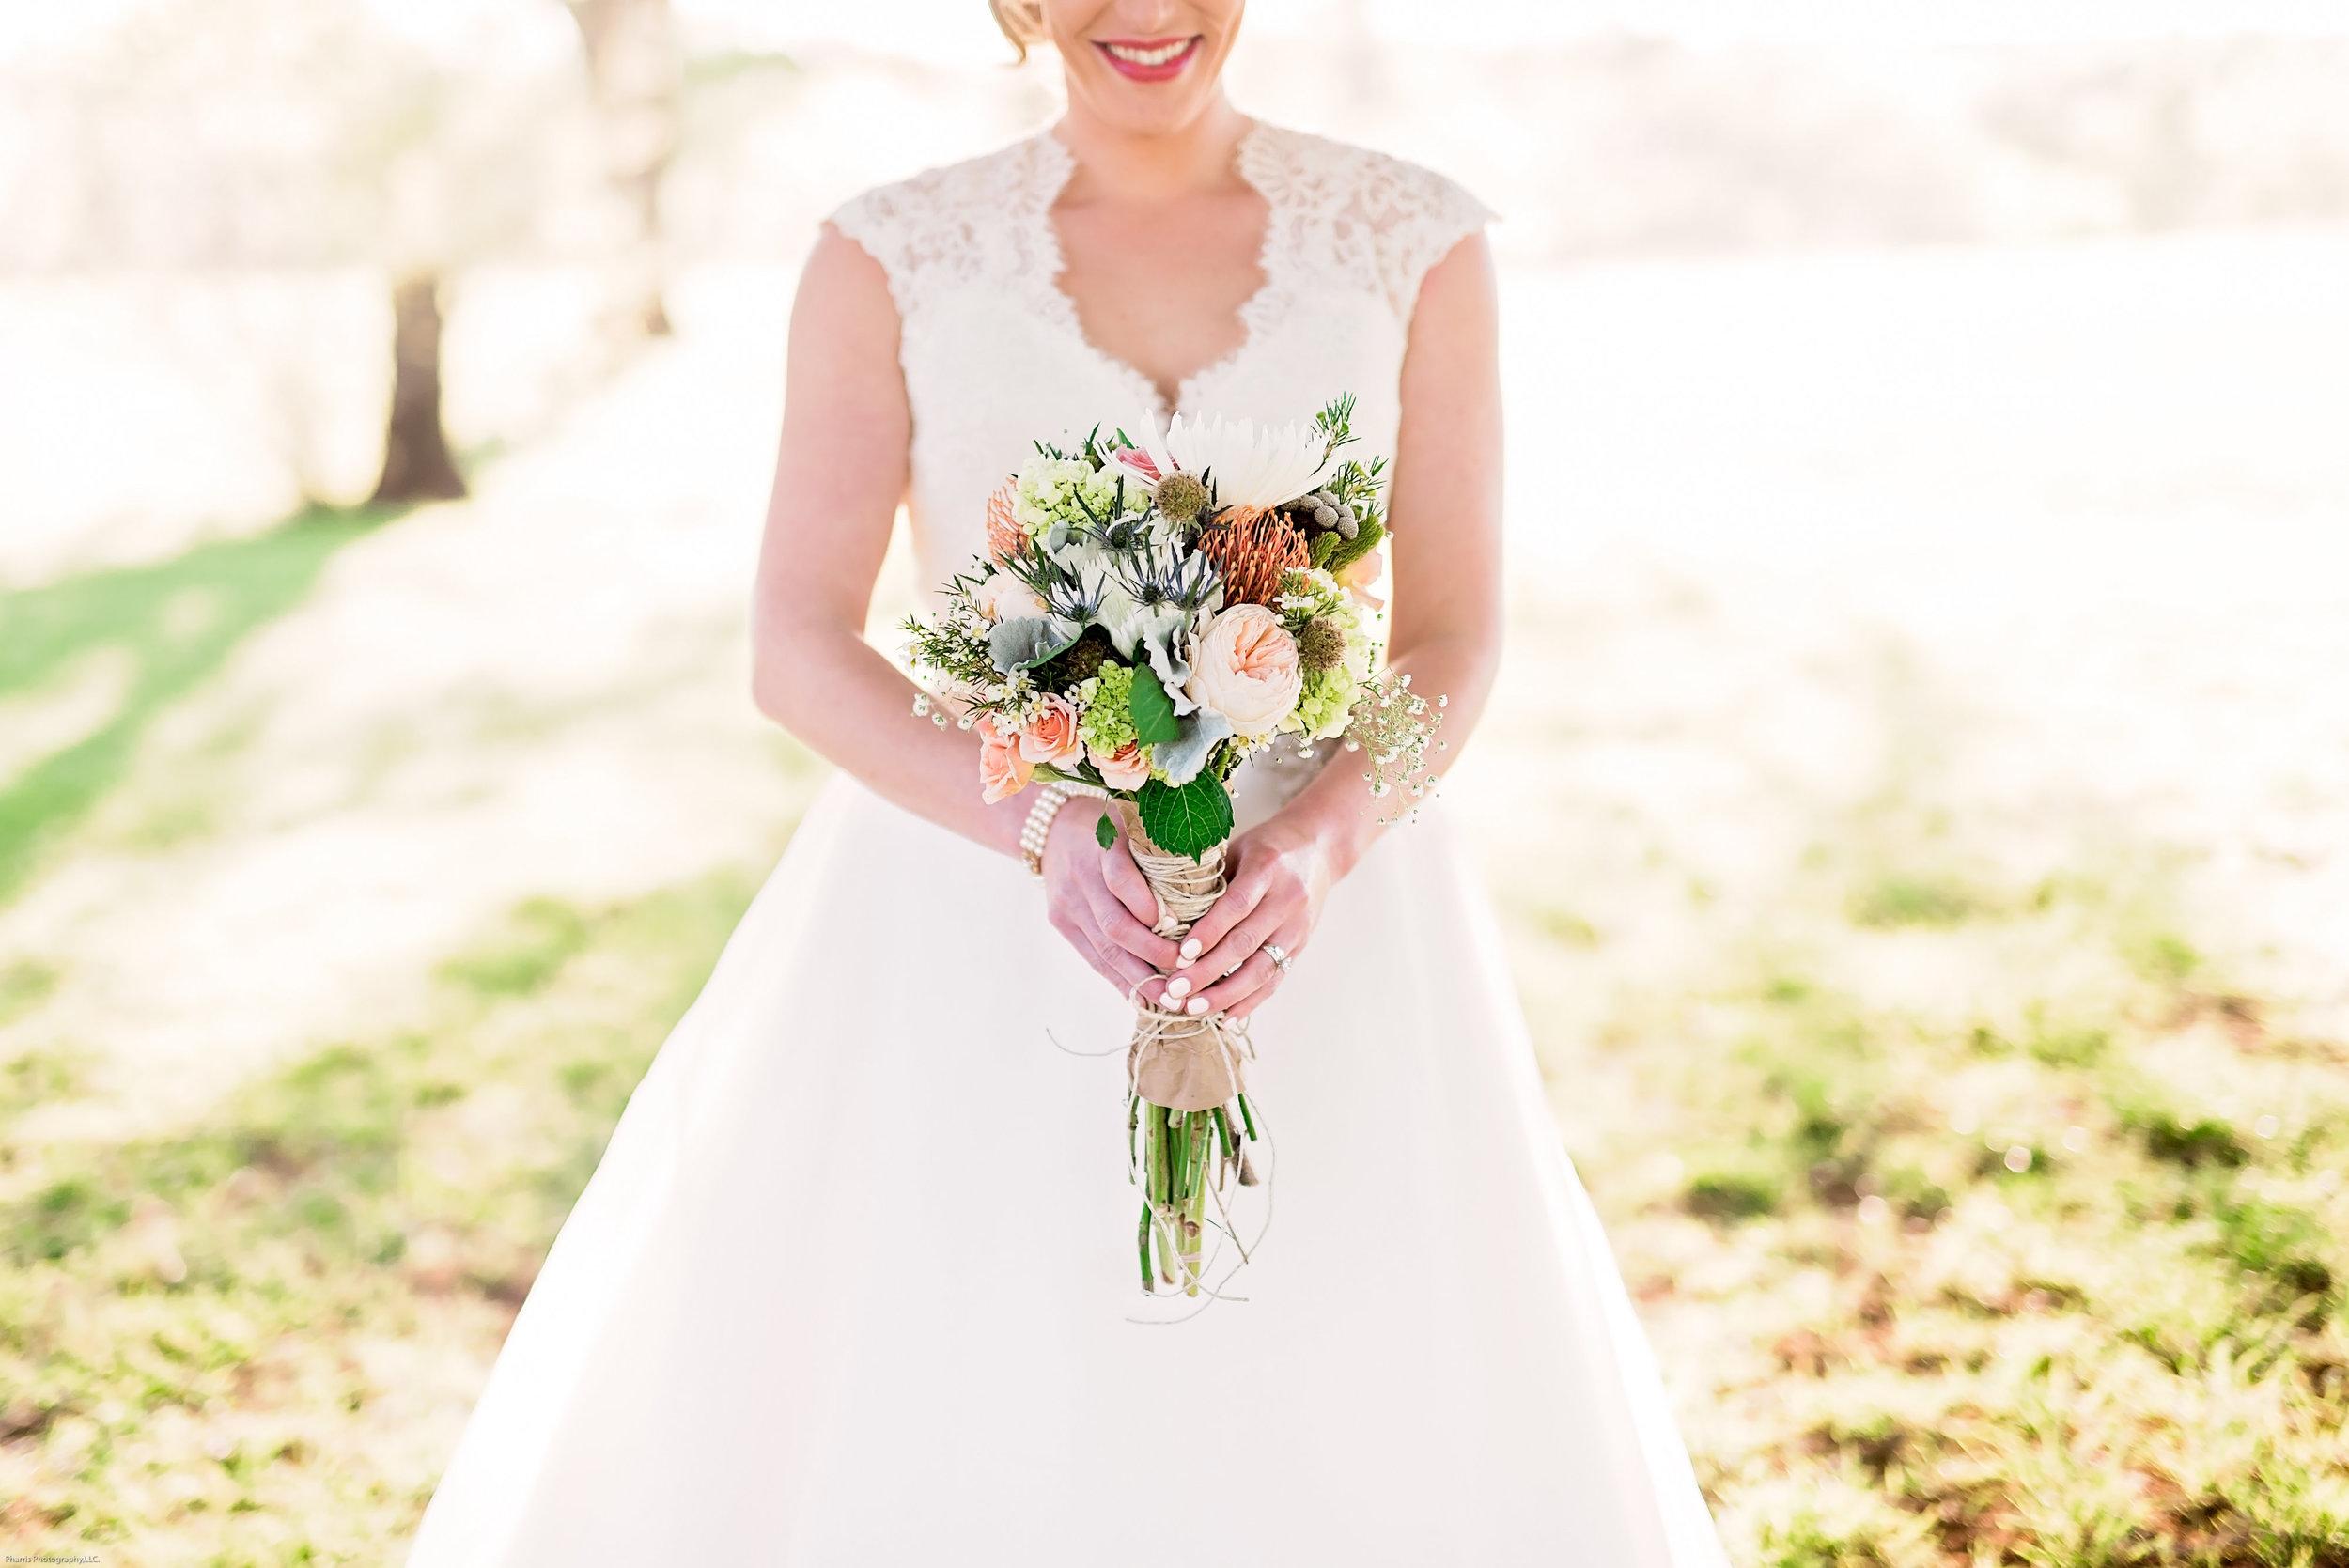 Taylor-Mallorie-Wedding-Pharris-Photos-0078.jpg